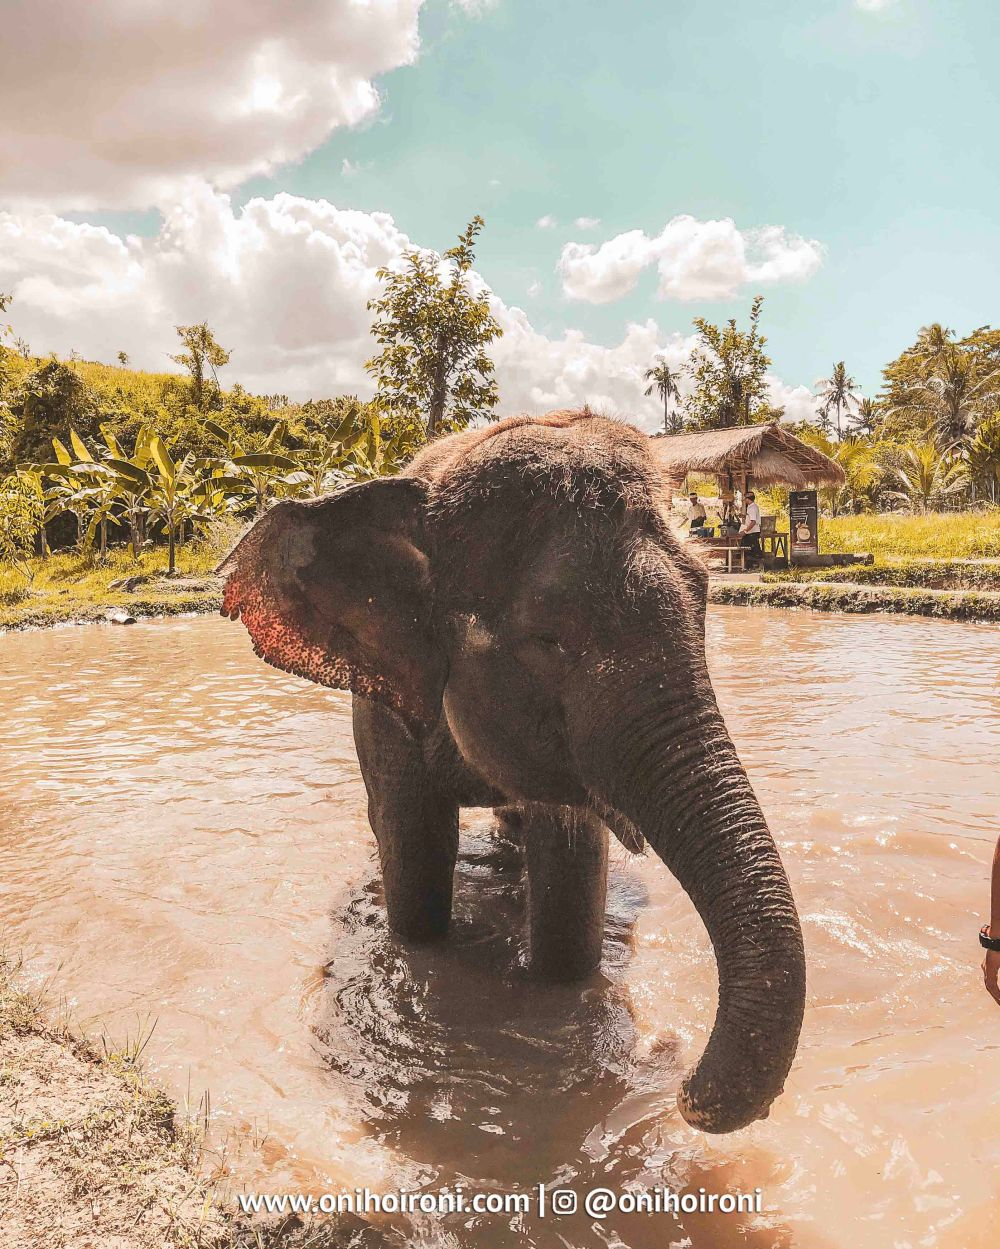 5 Bali Zoo Oni Hoironi Elephant mud fun